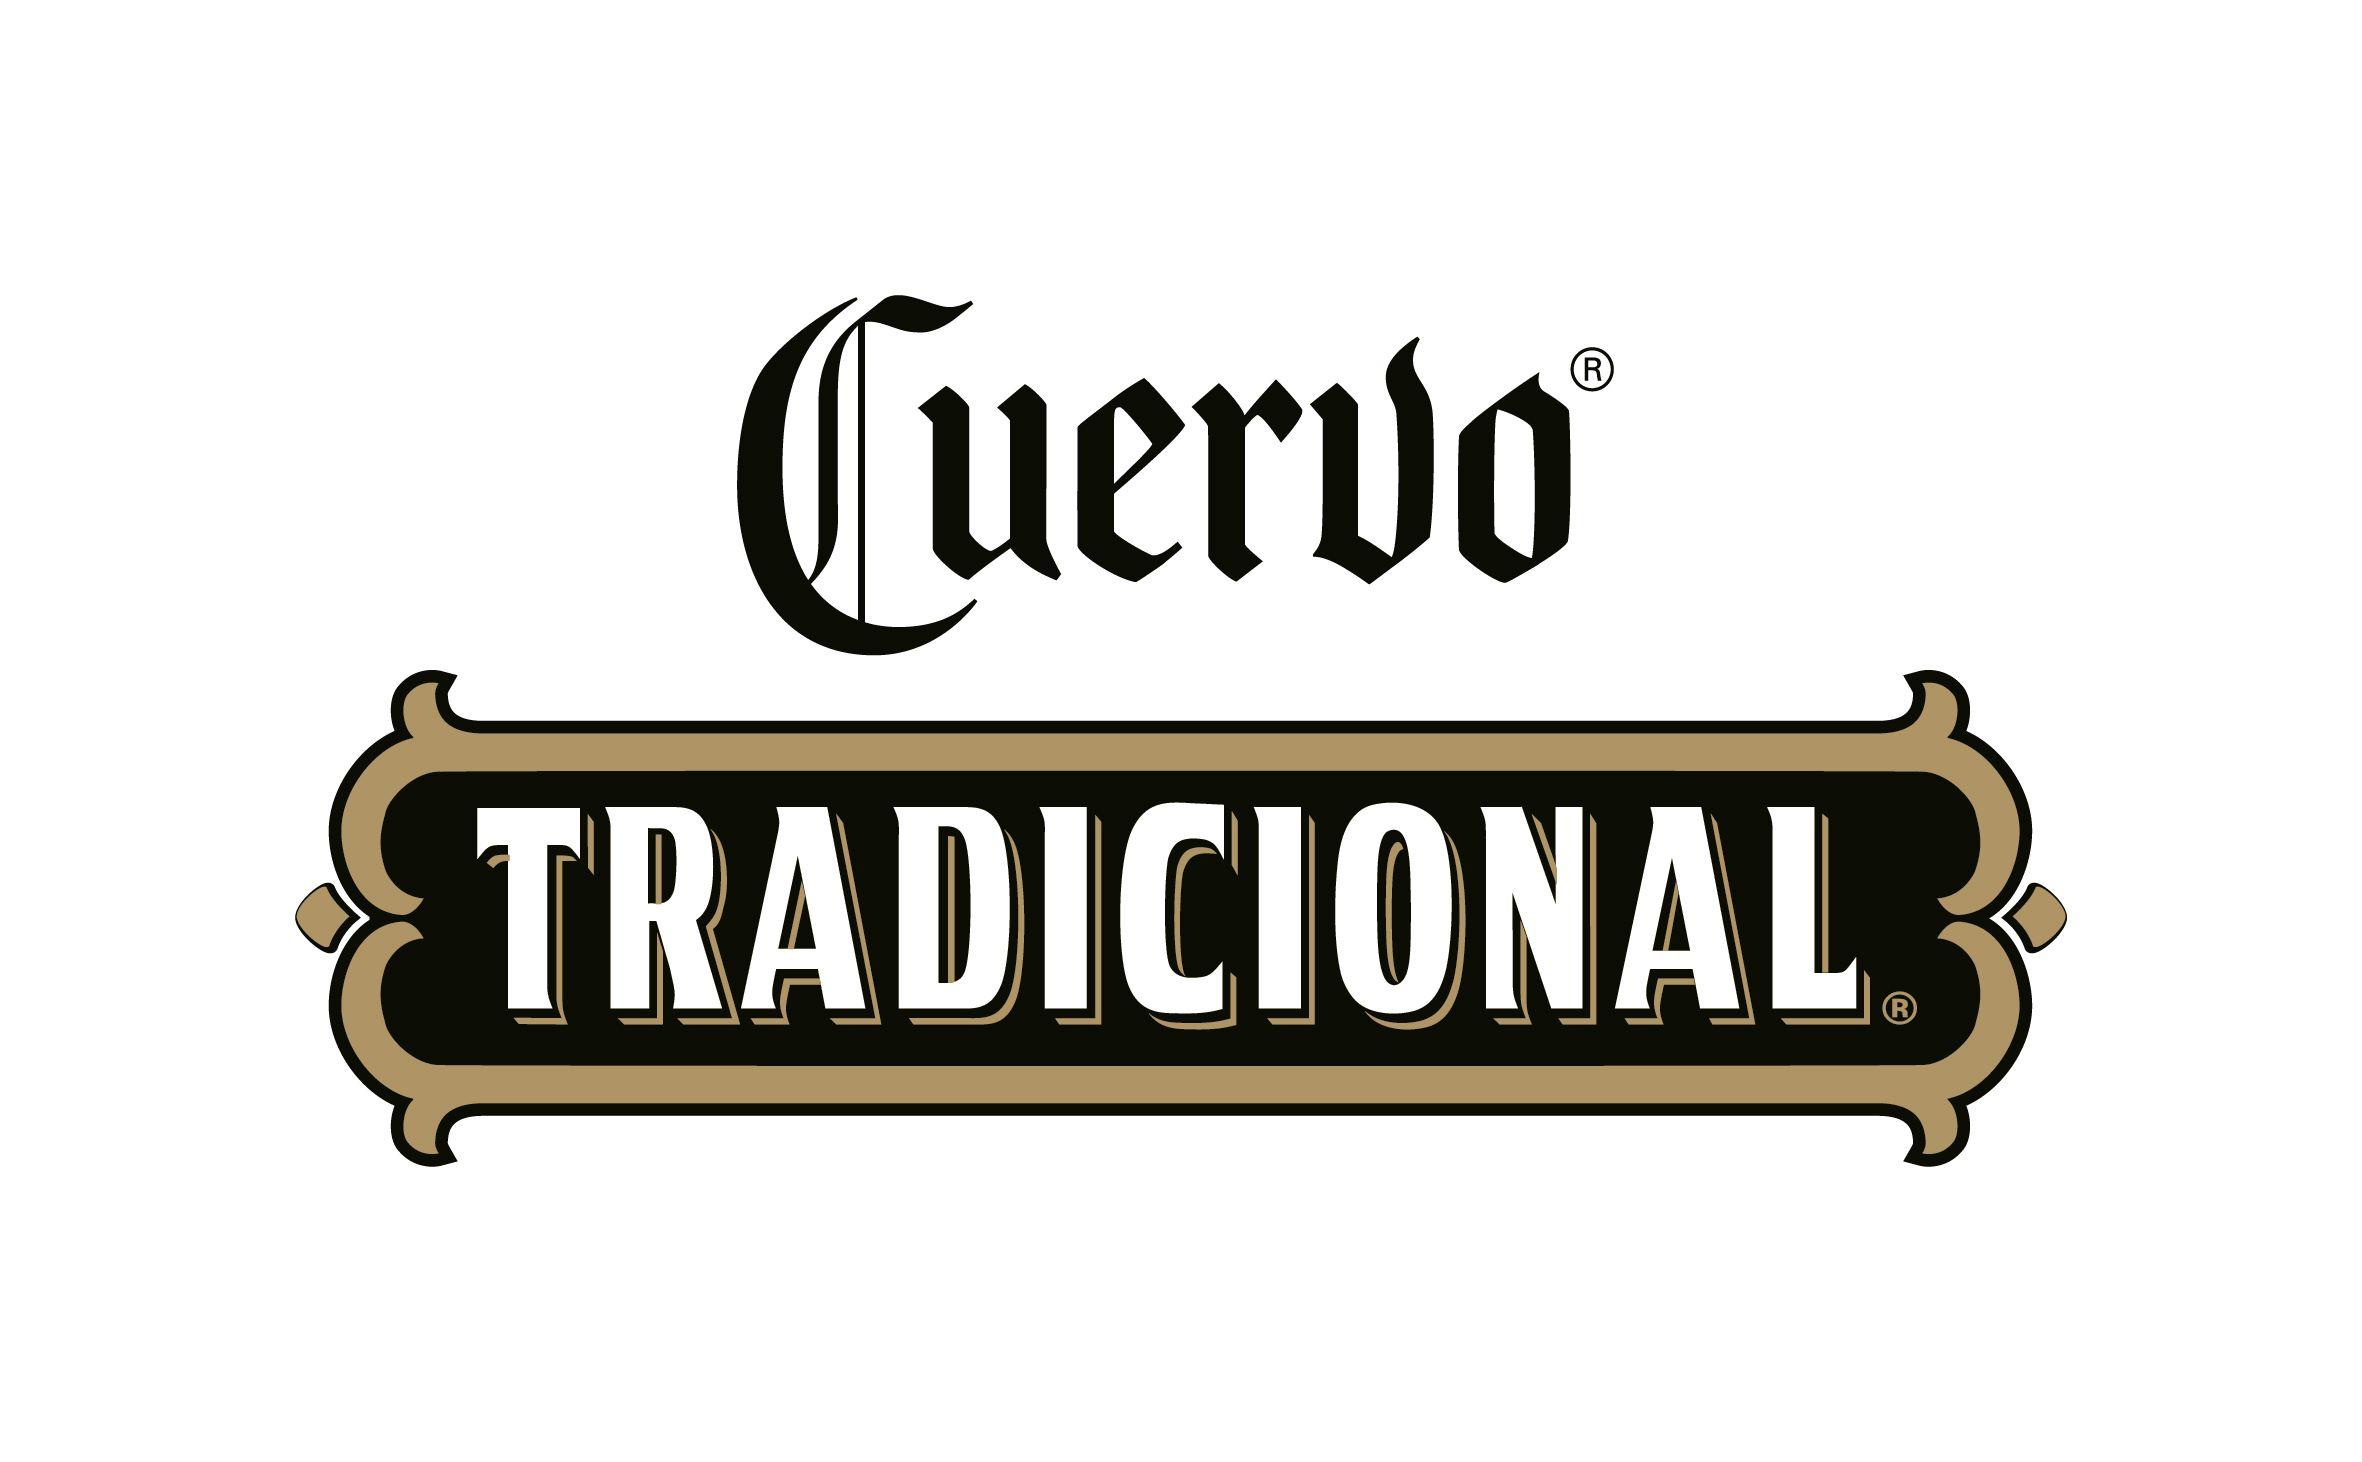 Tradicional tequila logo branded logos pinterest tequila tradicional tequila logo fandeluxe Images